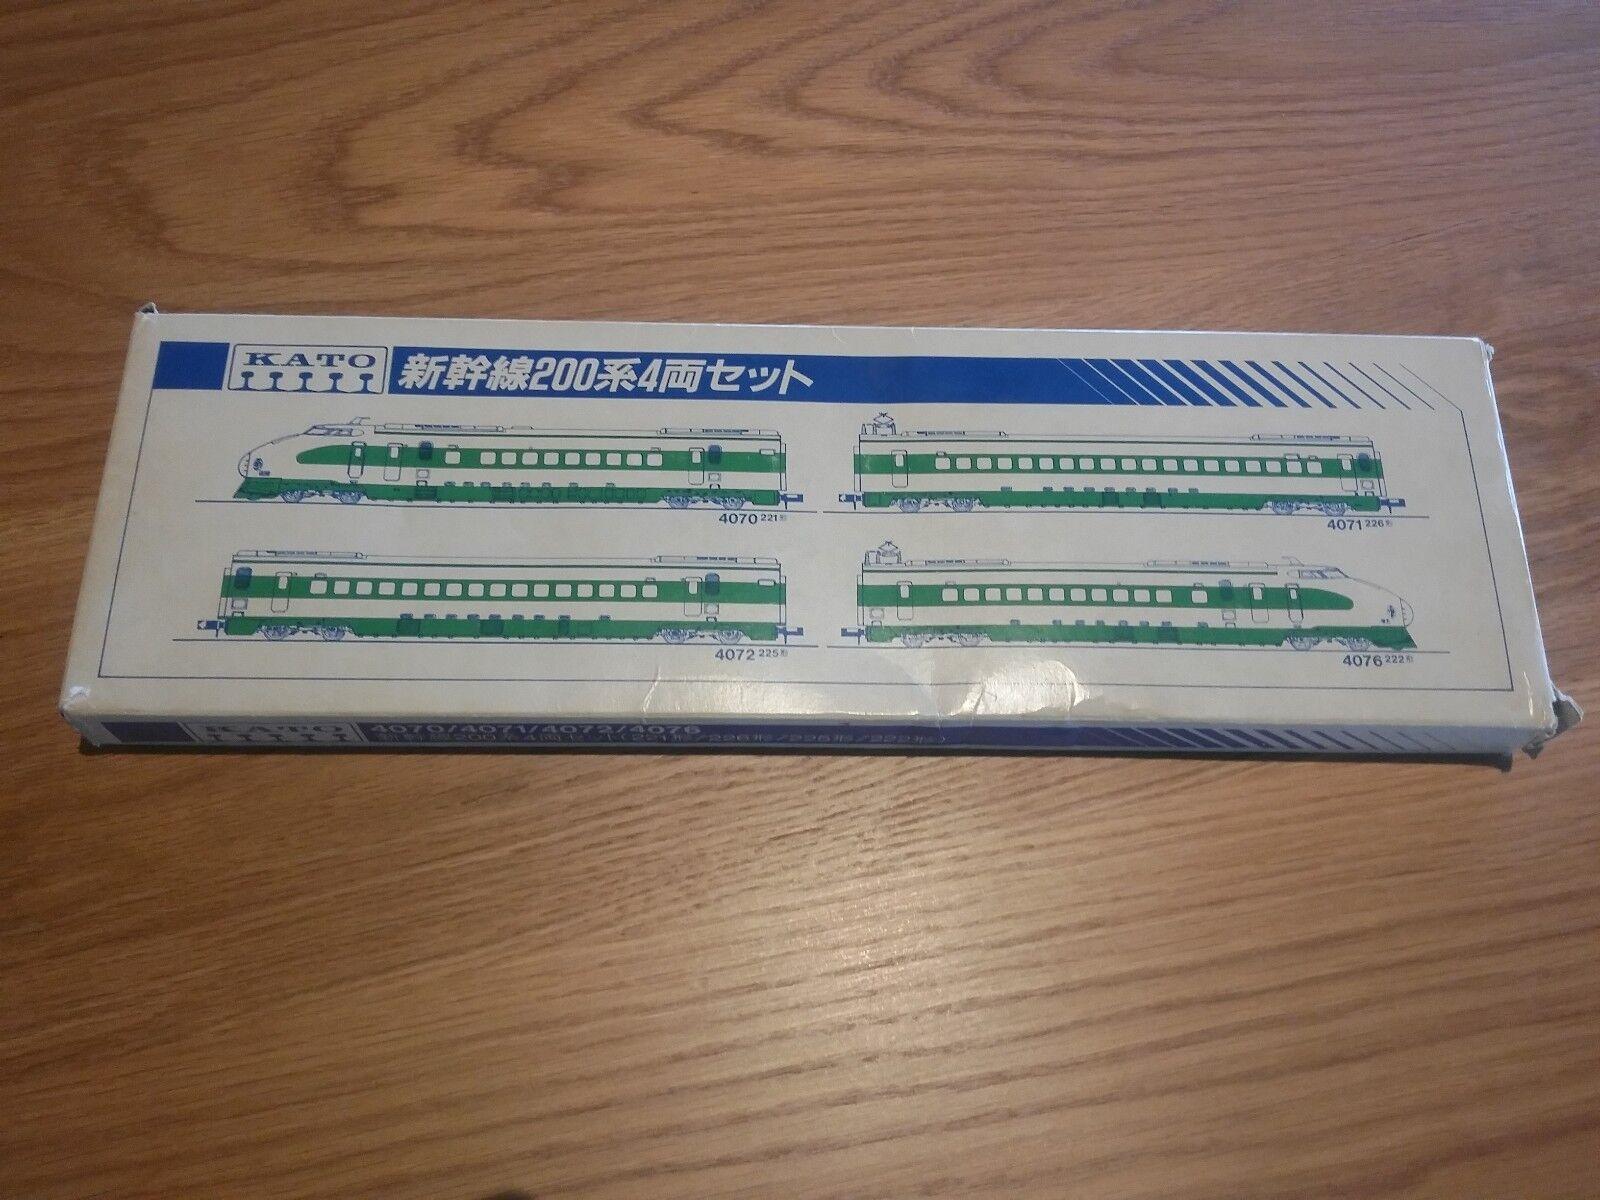 Kato årgång 200 Series NIB Tohoku -Joetsu Shinkansen Bullet Train 4 bils Set - N